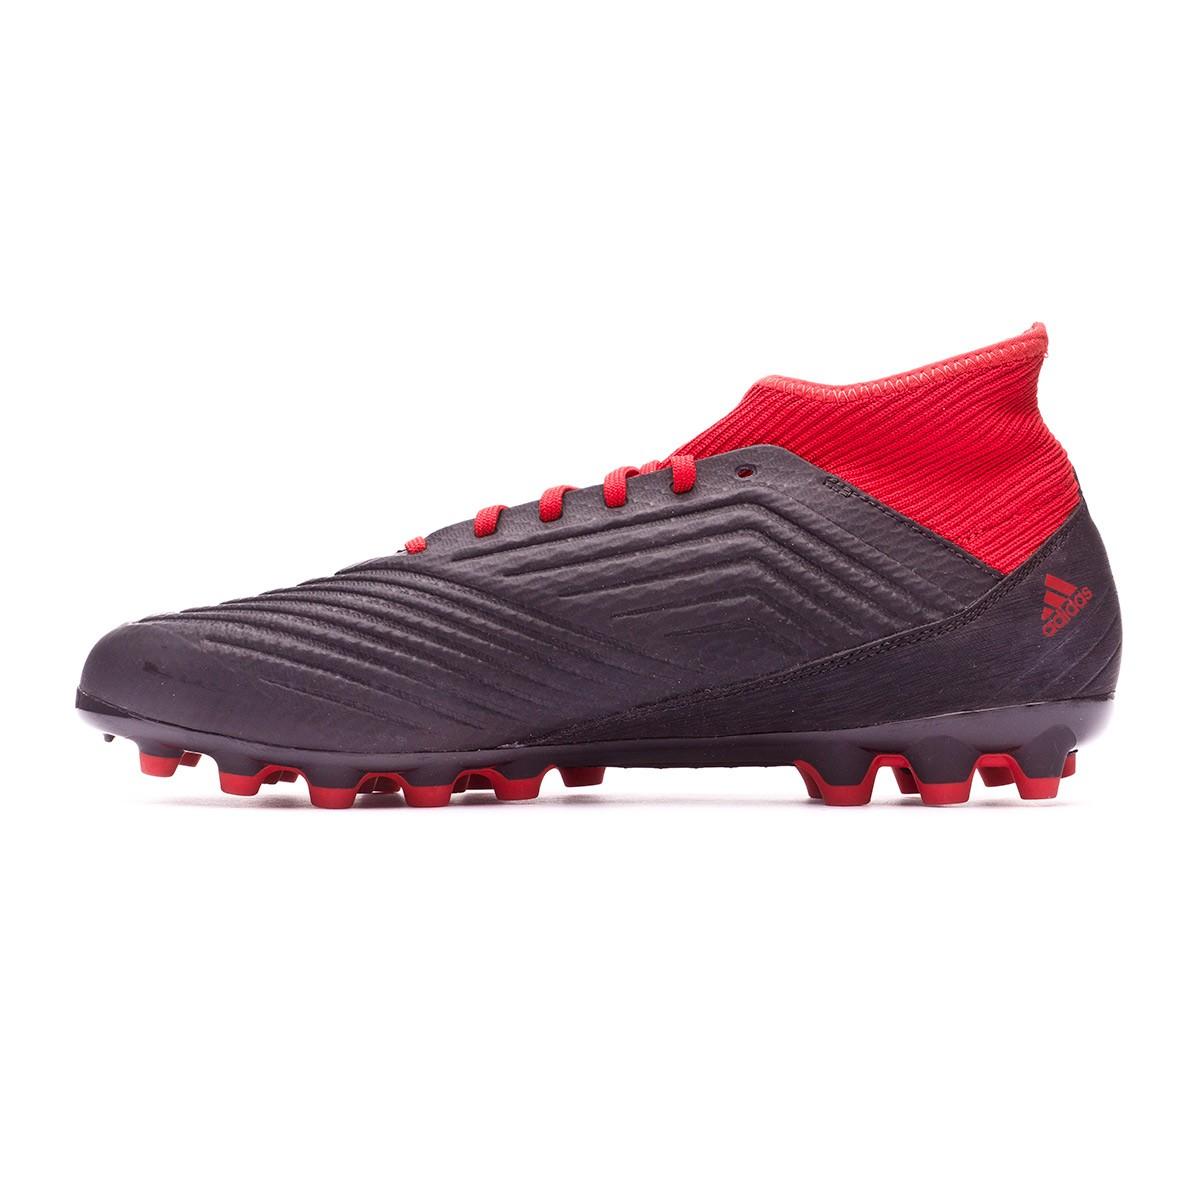 meet 34372 0e594 Boot adidas Predator 18.3 AG Core black-White-Red - Football store Fútbol  Emotion